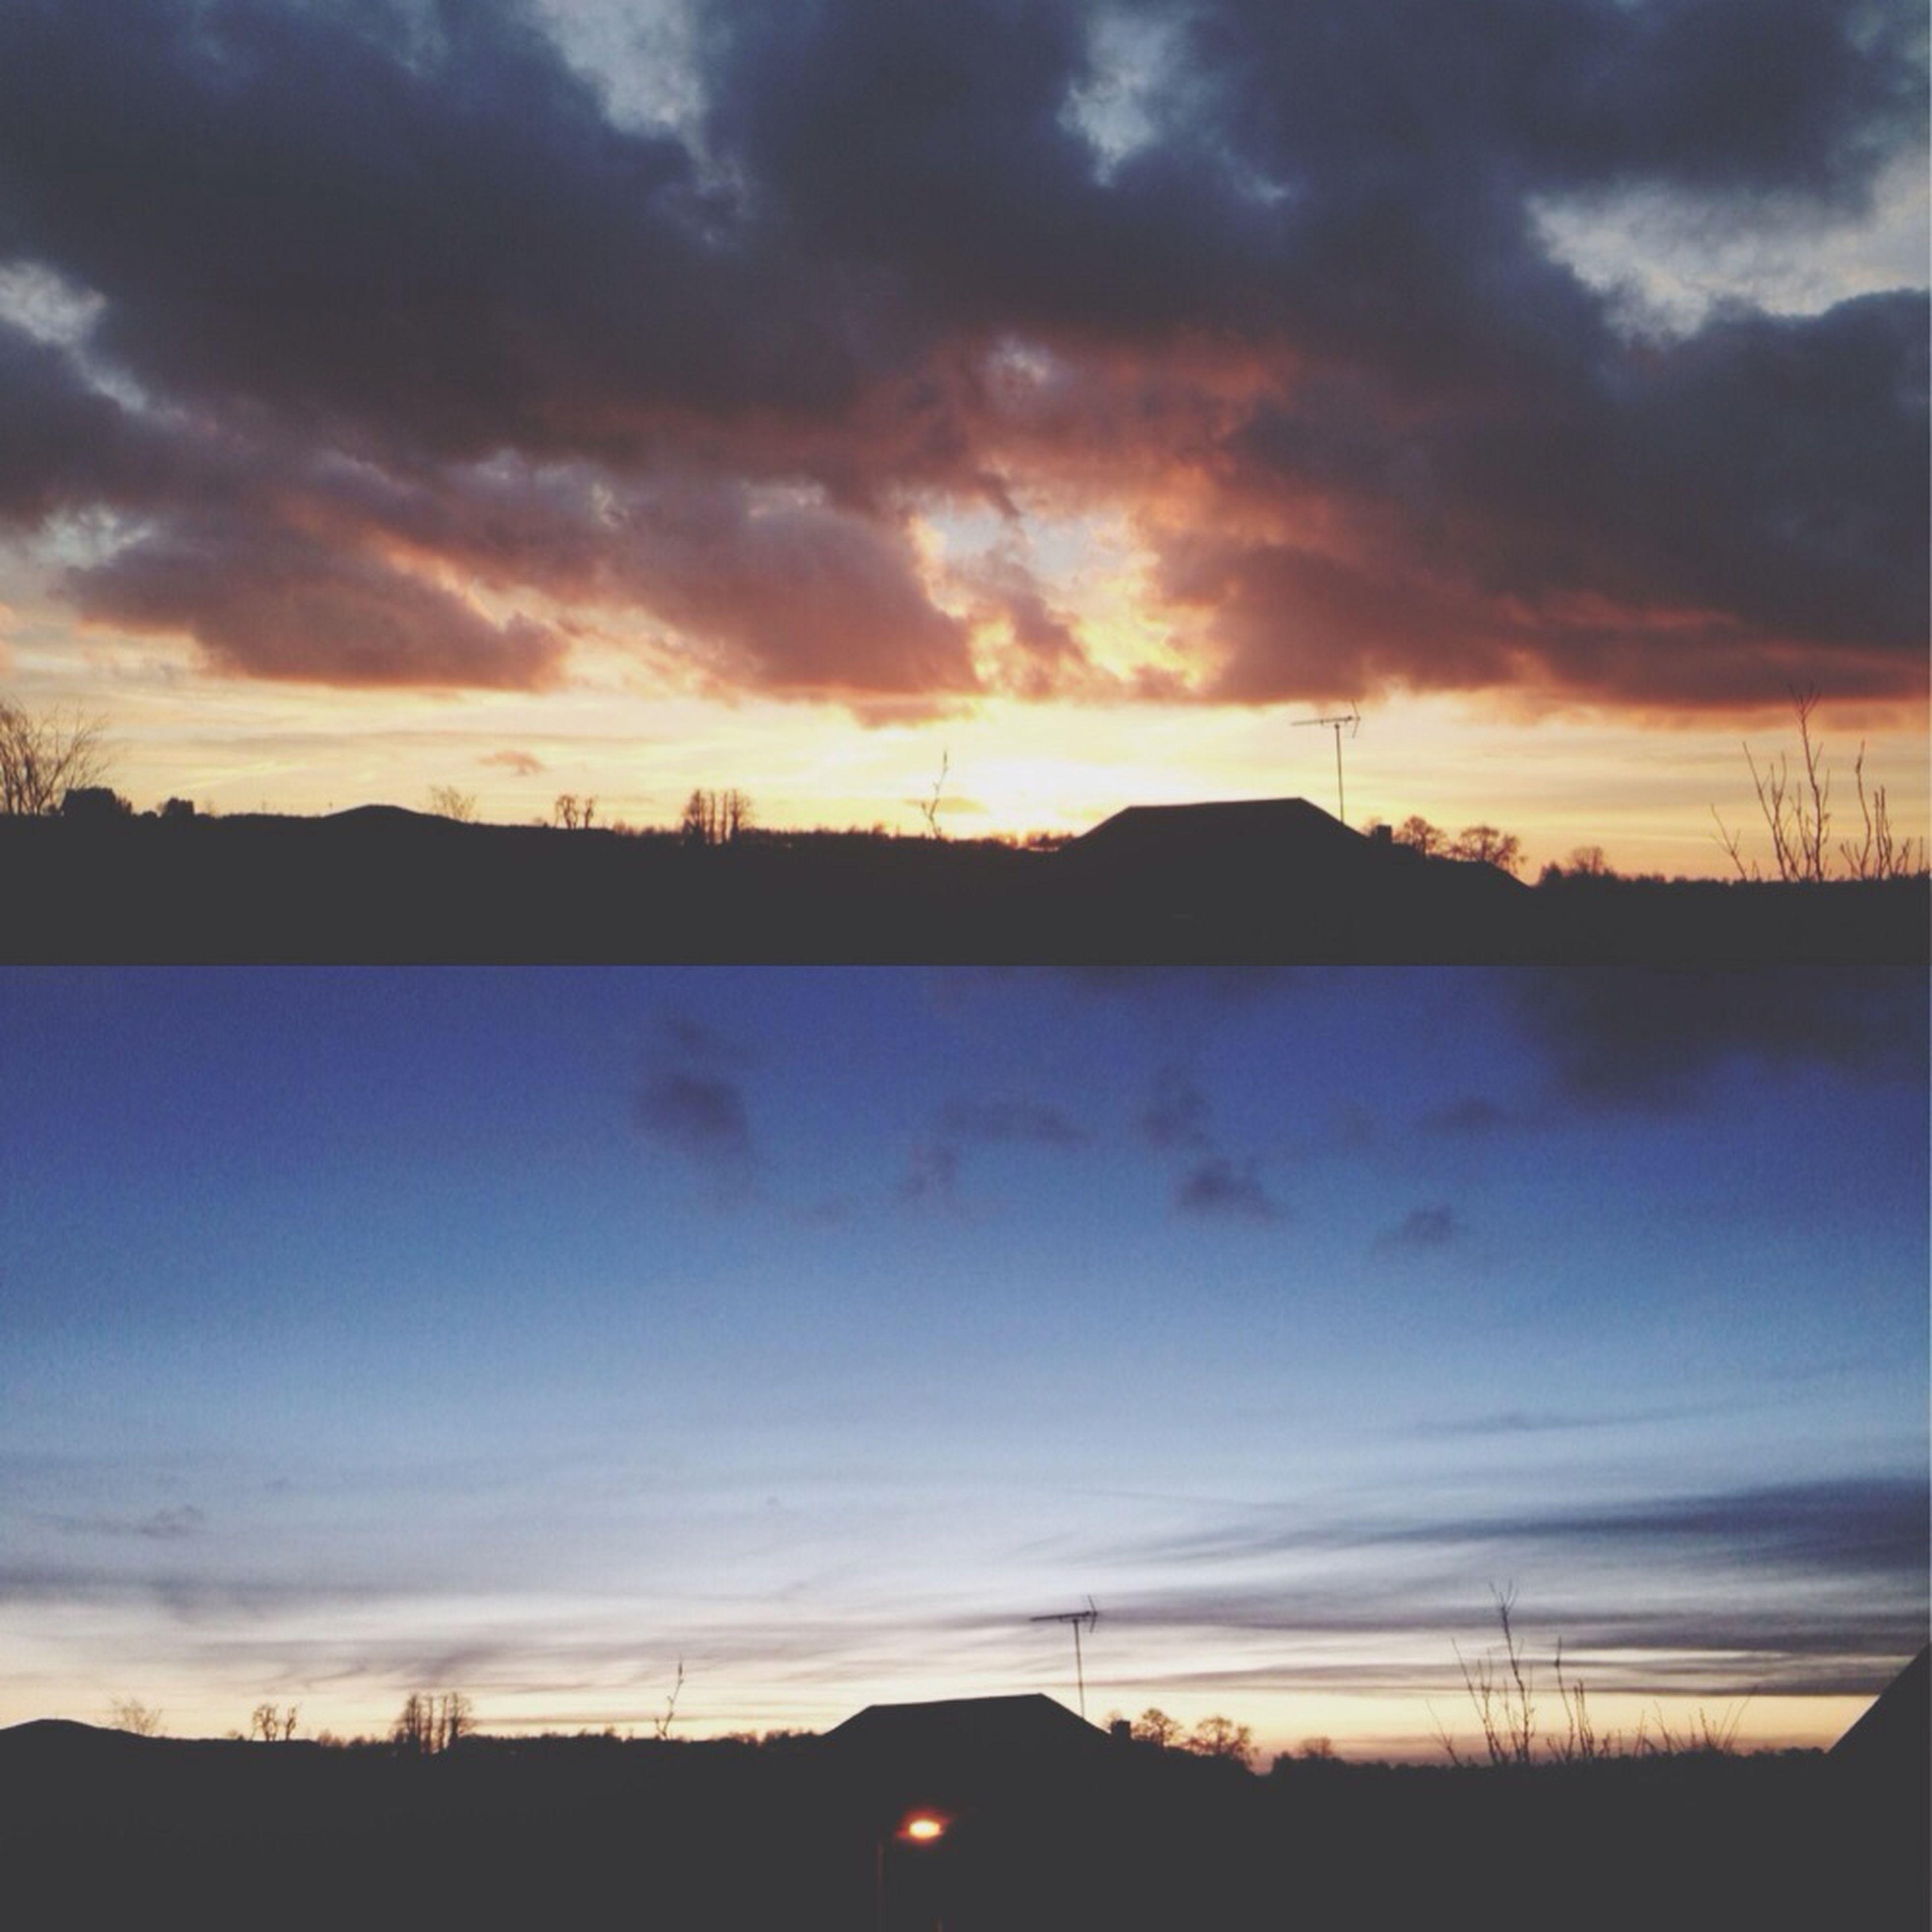 sunset, silhouette, sky, scenics, tranquil scene, cloud - sky, beauty in nature, tranquility, orange color, landscape, dramatic sky, nature, cloud, idyllic, cloudy, moody sky, field, electricity pylon, dark, atmospheric mood